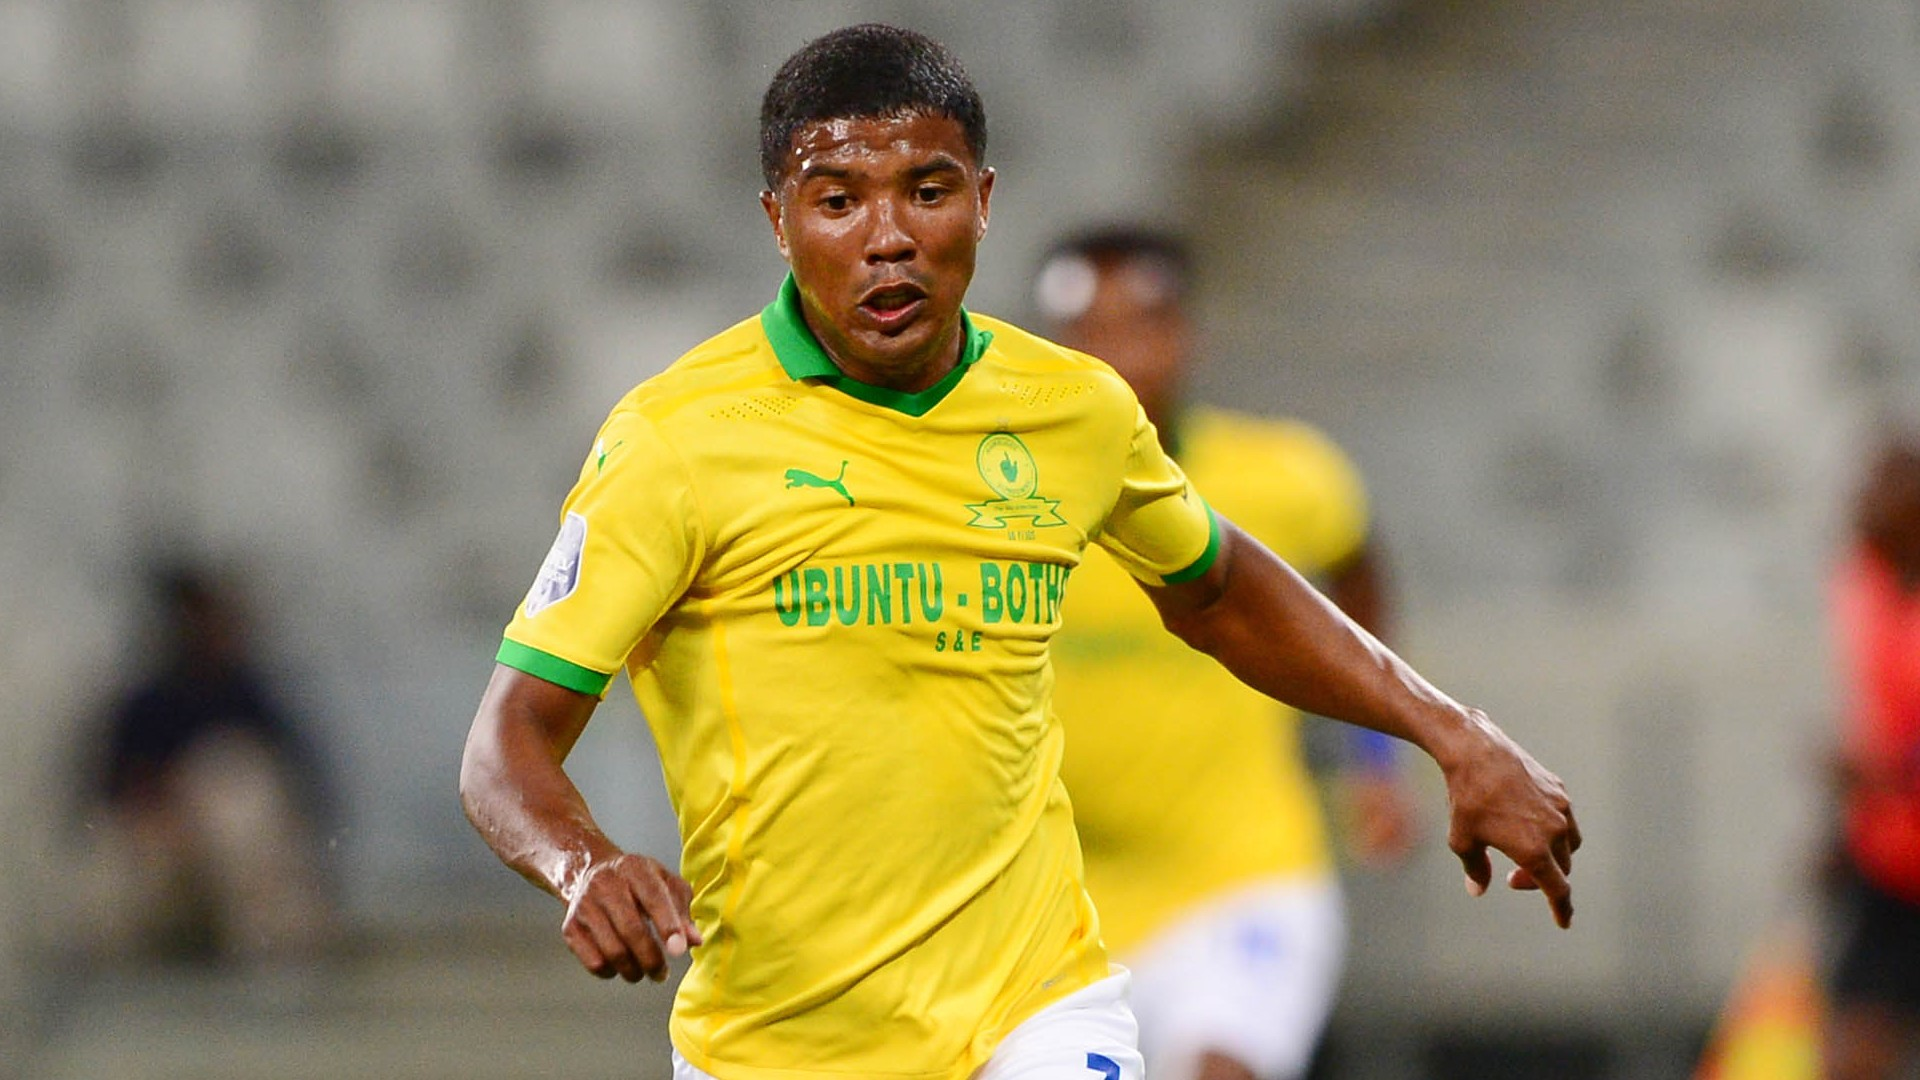 Why is Mamelodi Sundowns' Lakay not in Bafana Bafana squad? Mokwena doesn't understand